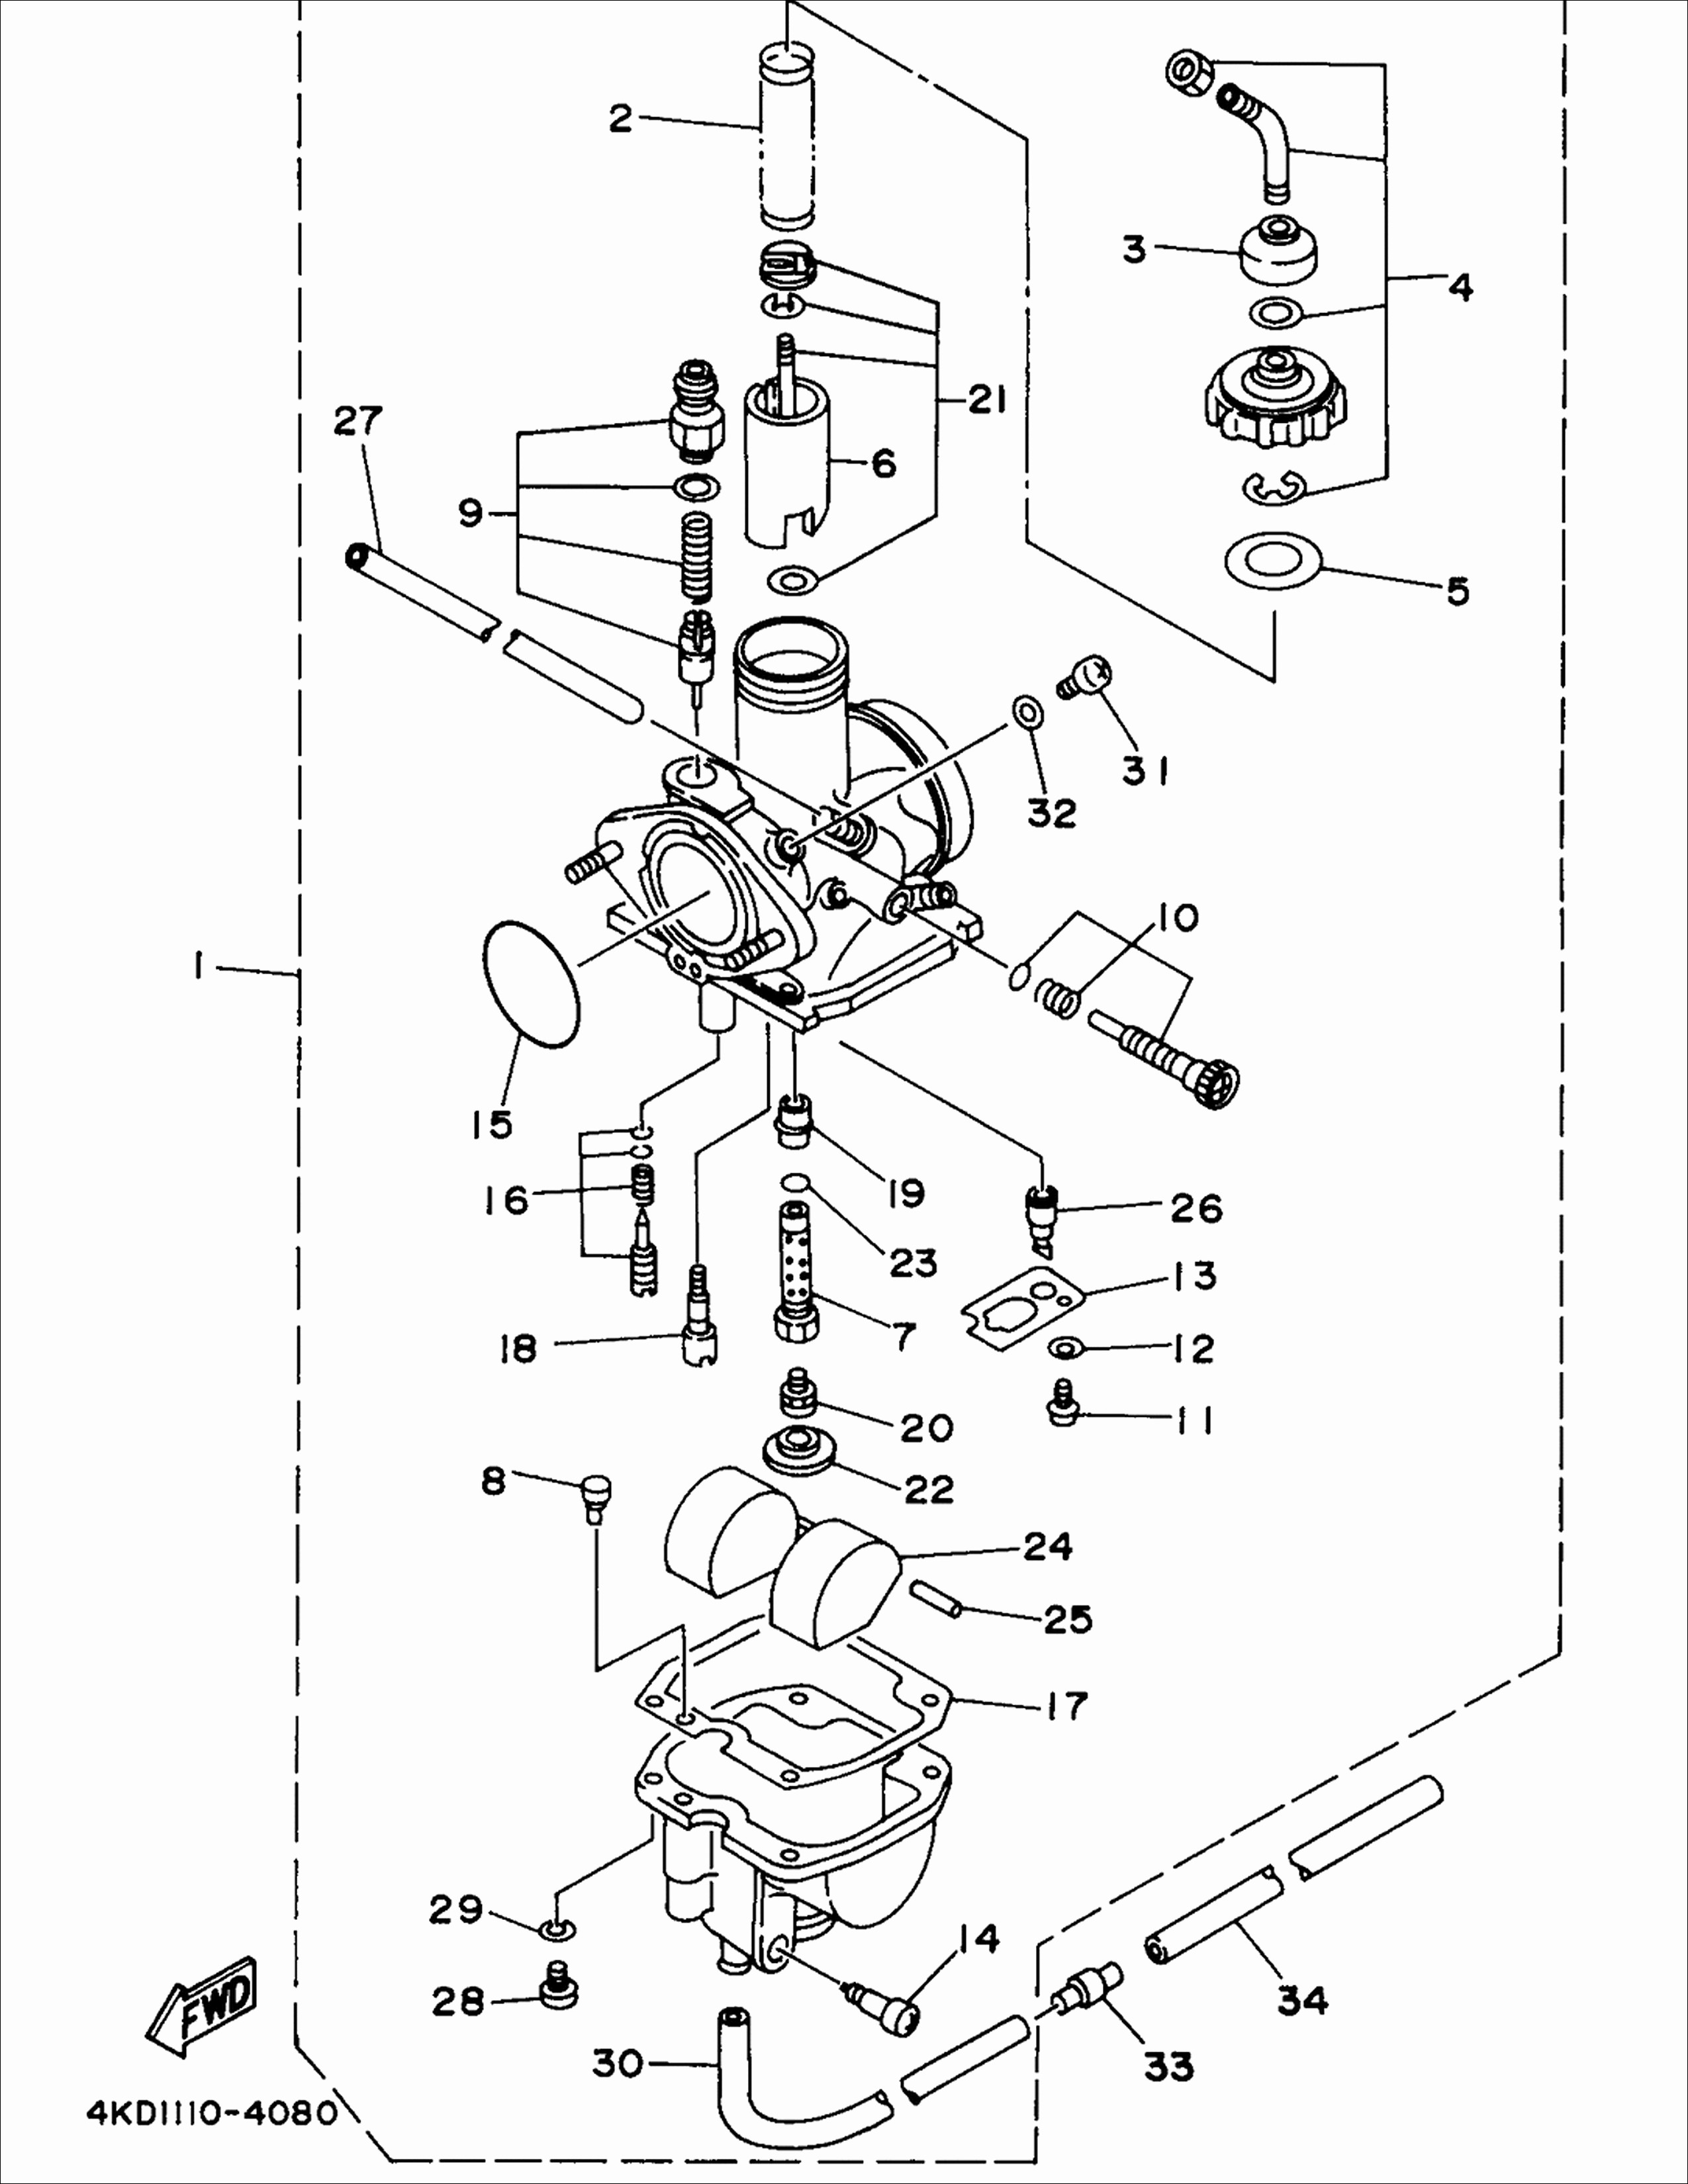 DIAGRAM] Wiring Diagram For 1996 Pontiac Grand Prix FULL Version HD Quality Grand  Prix - SEARCHENGINETECHNIQUE.MAMI-WATA.FR Diagram Database - Mami Wata